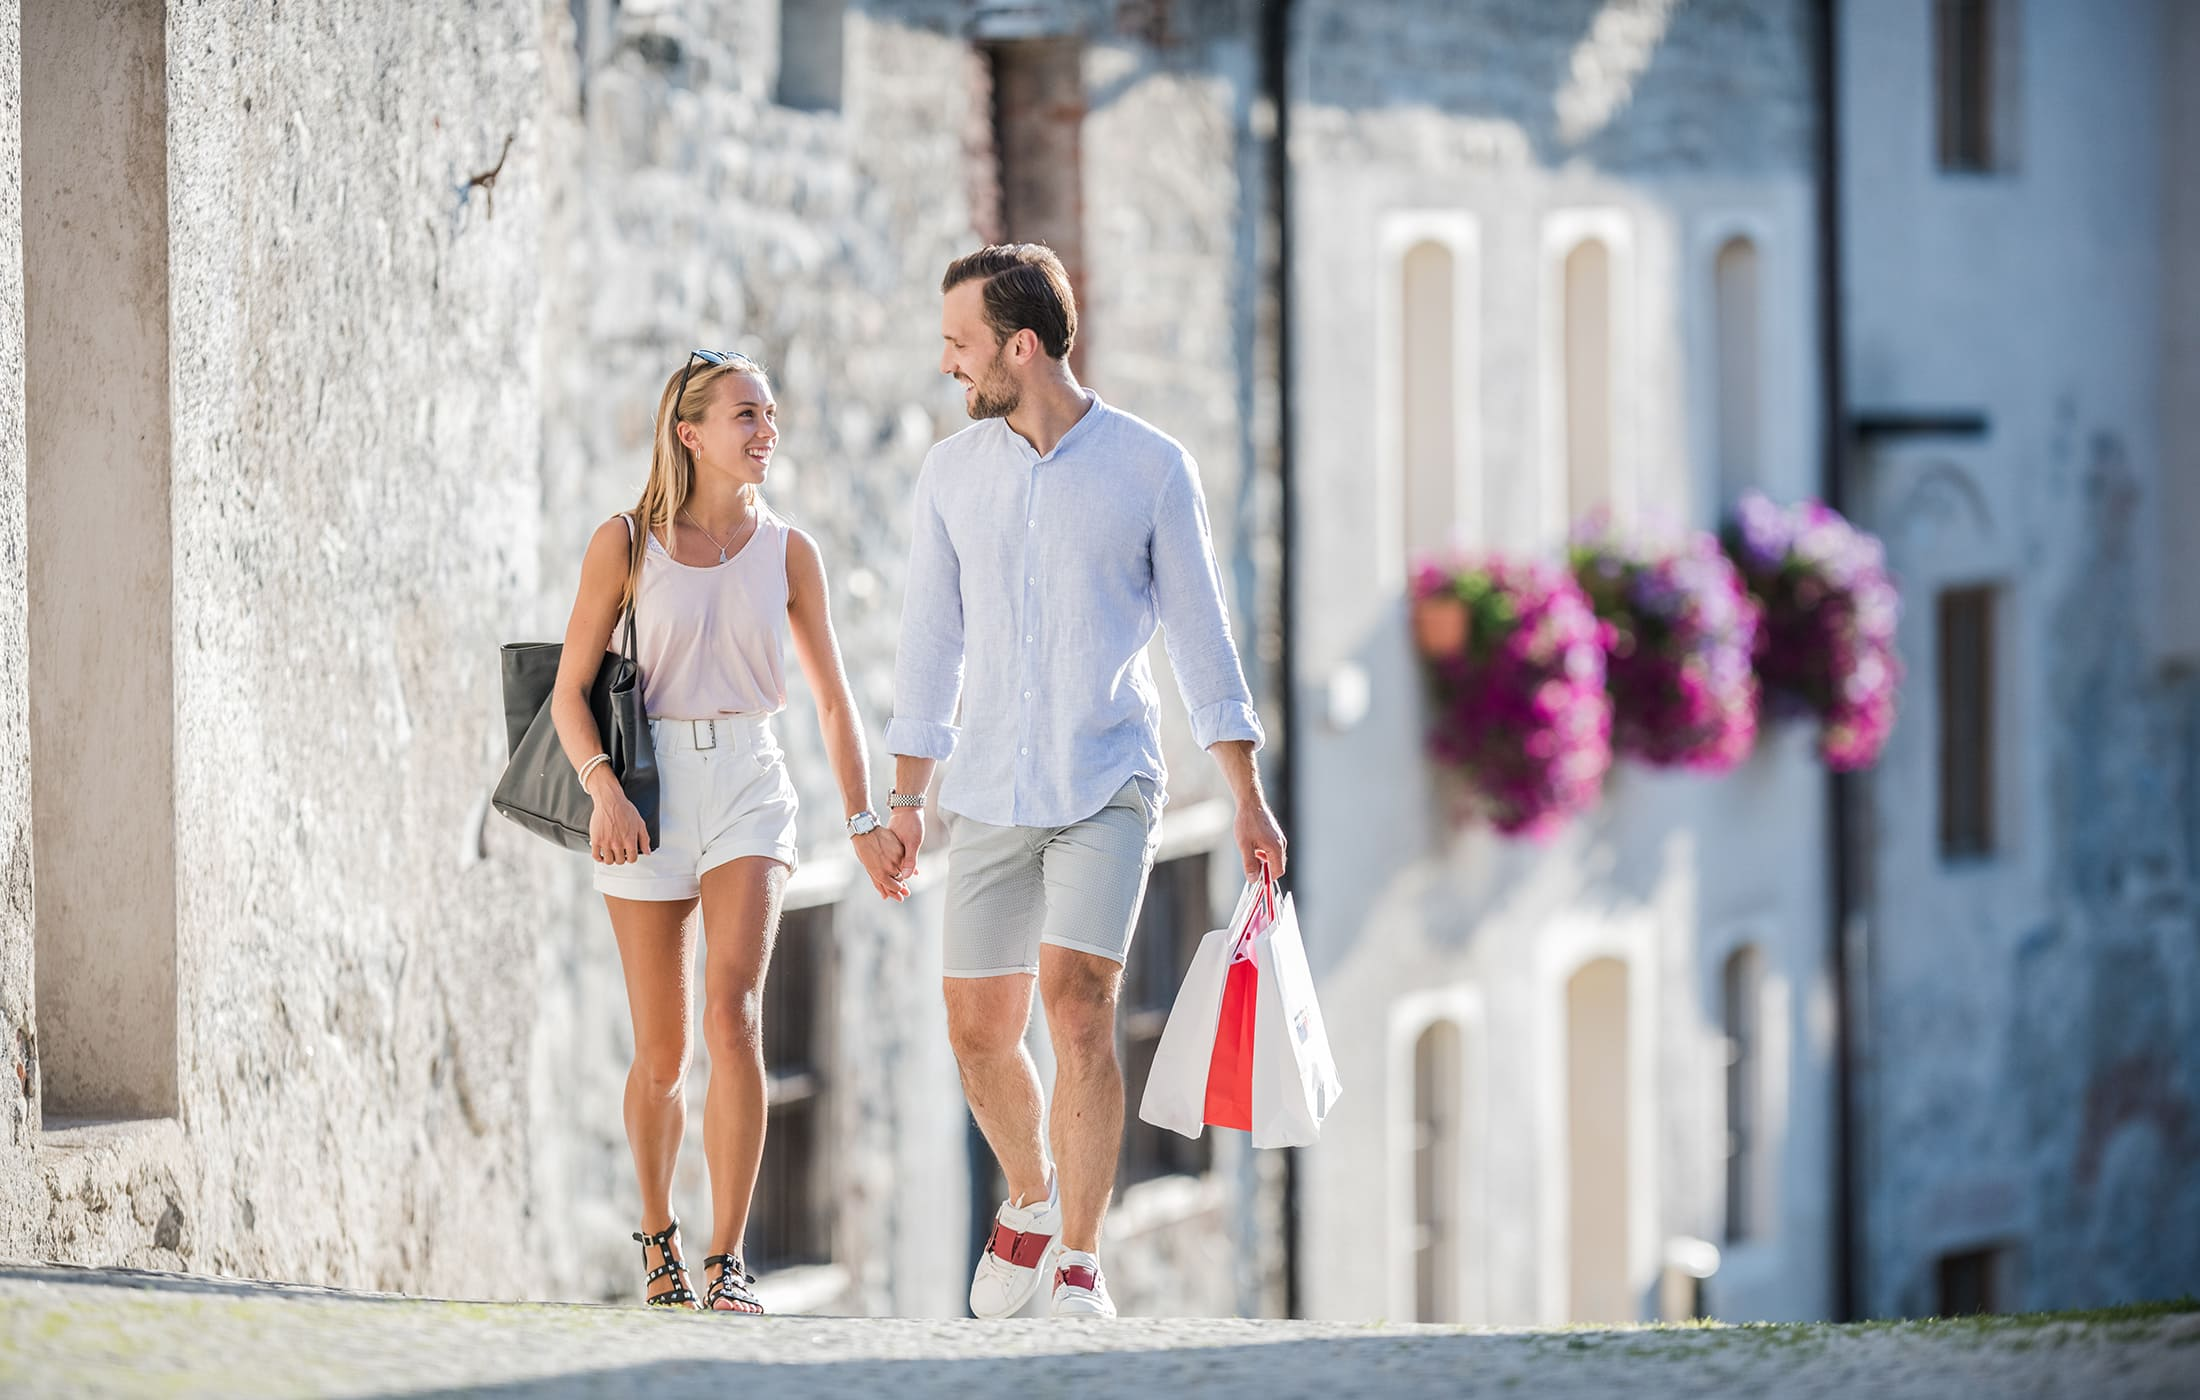 Christlrumerhof - Header Shopping